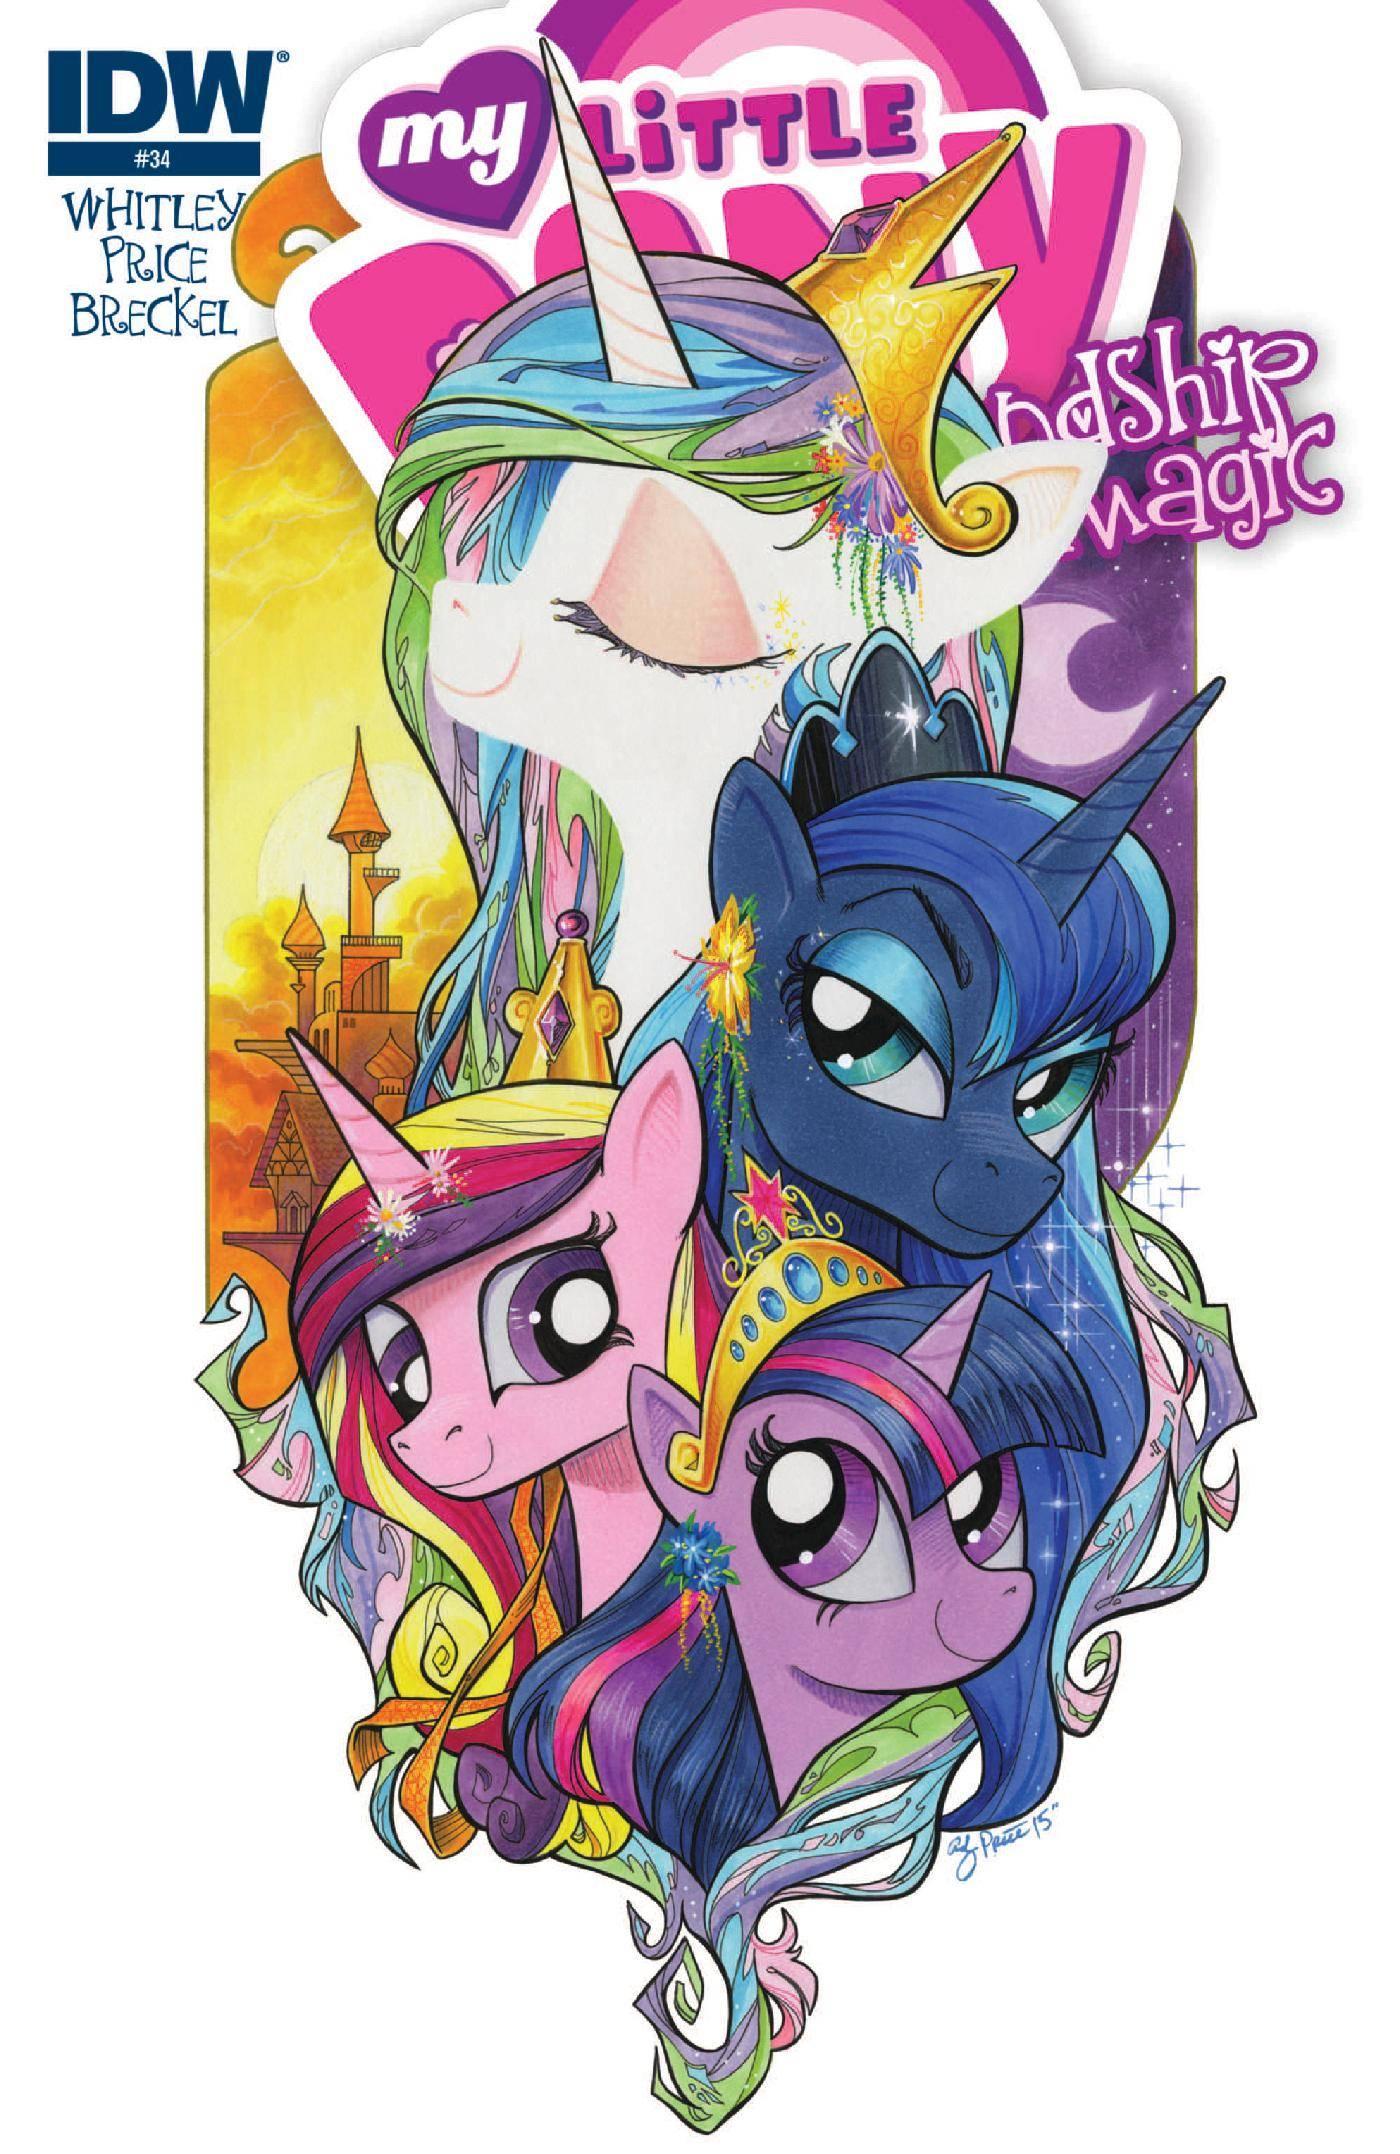 My Little Pony - Friendship Is Magic 034 2015 digital